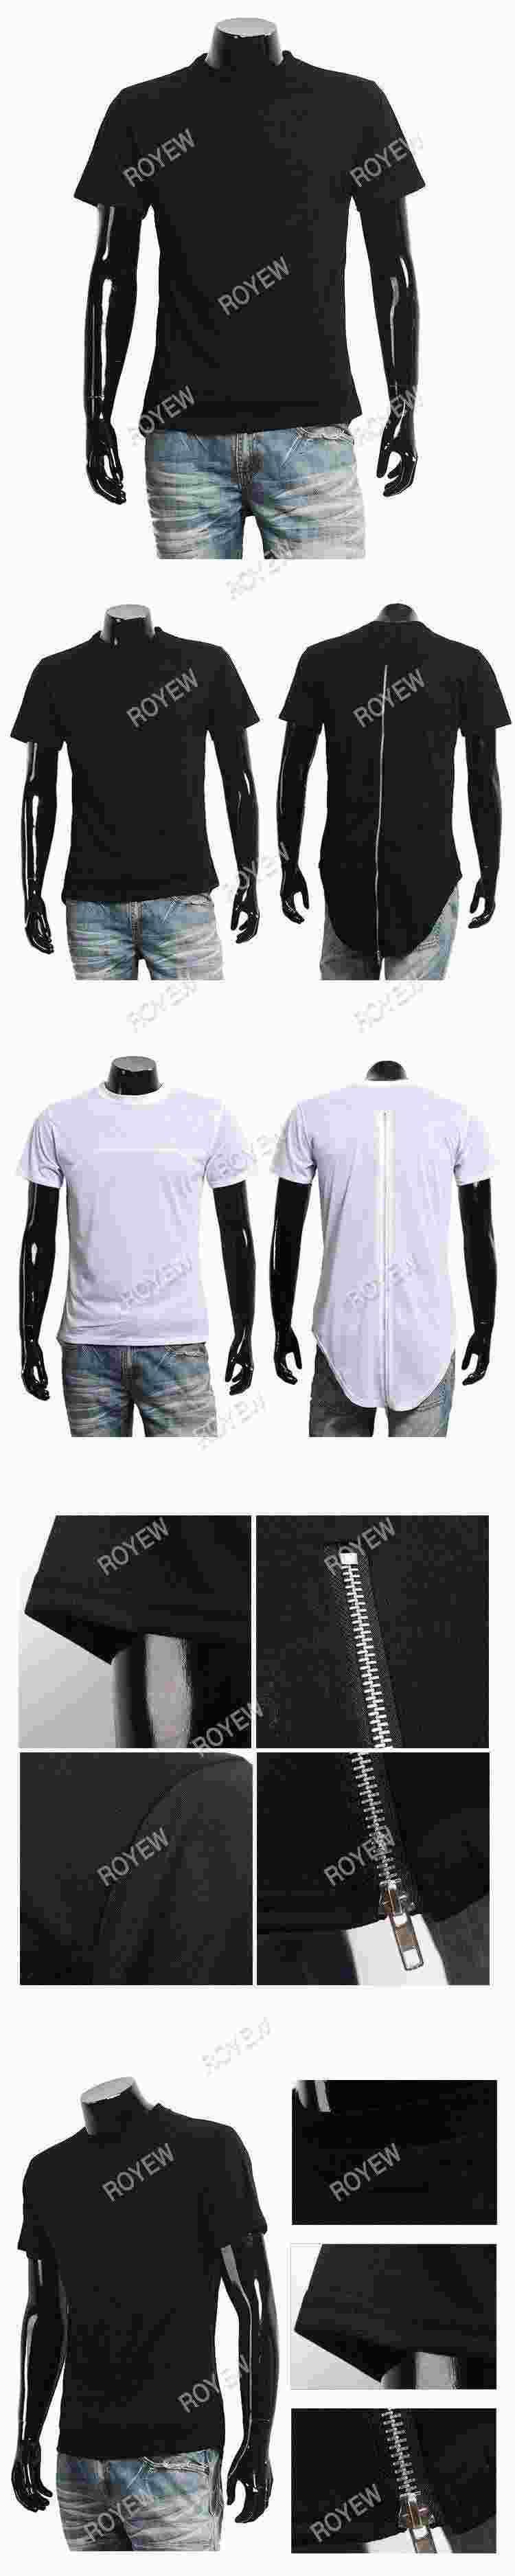 ROYEW Black White T shirt tyga Hot sale XXL Long Back Zipper Streetwear Swag Man Hip Hop Skateboard T-shirt Top Tee Men Clothing